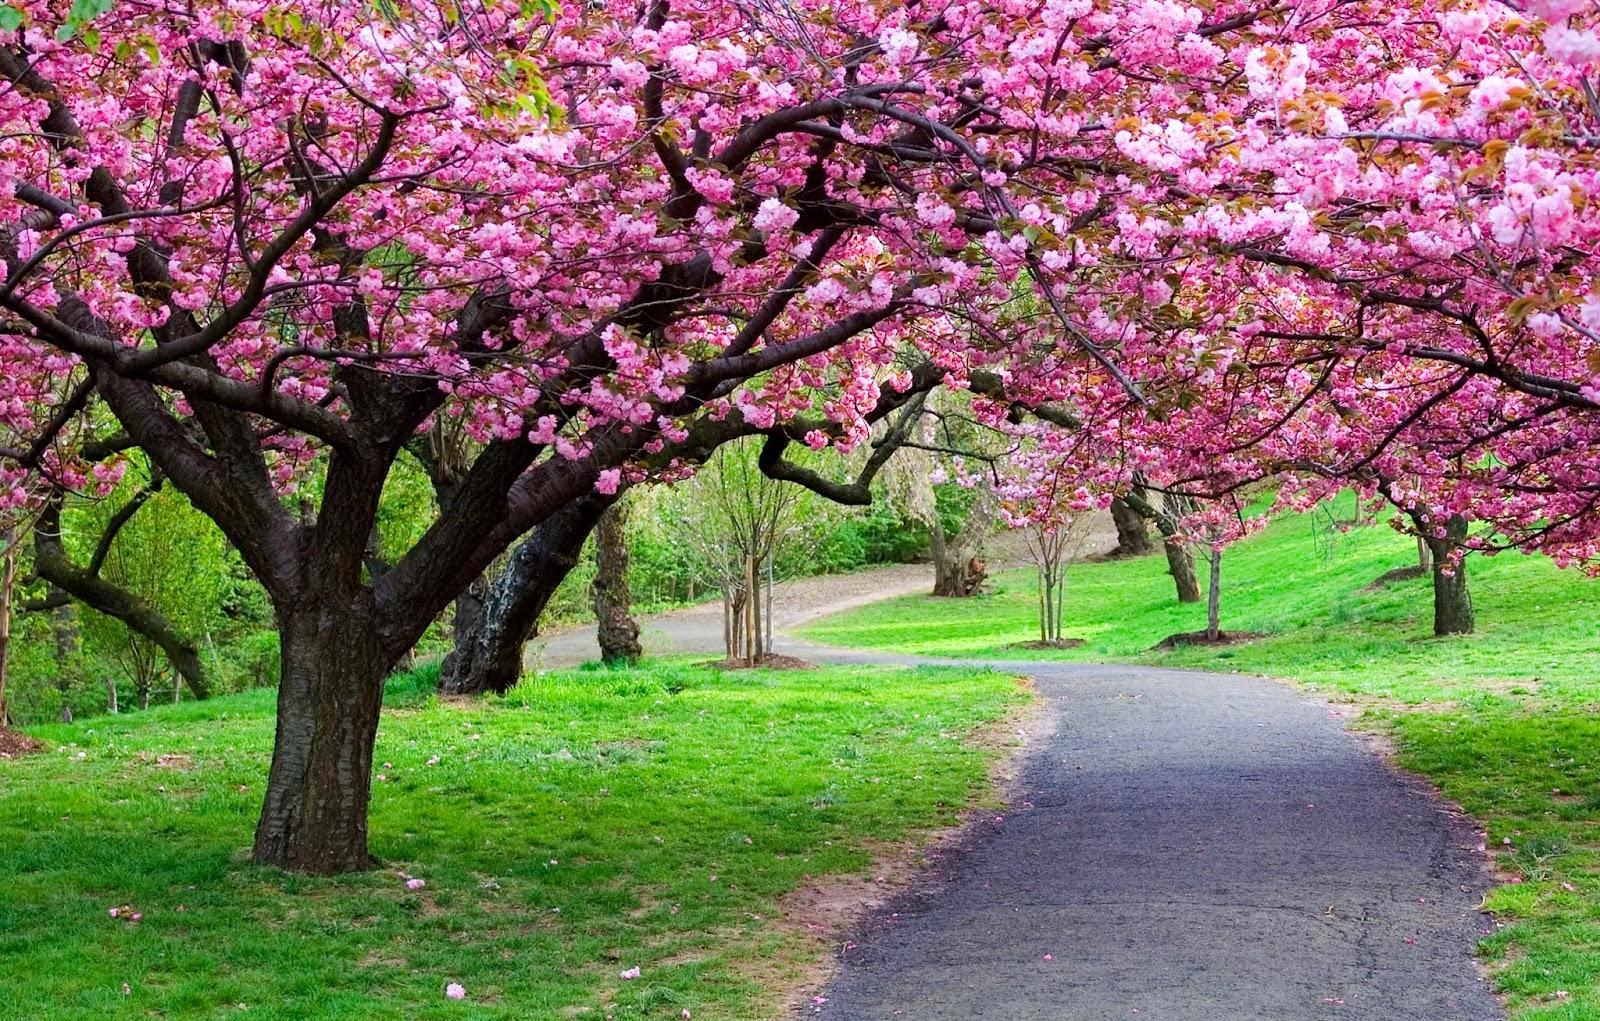 cherry blossom tree wallpaper hdtree flower park path grass cherry blossom sakura nature